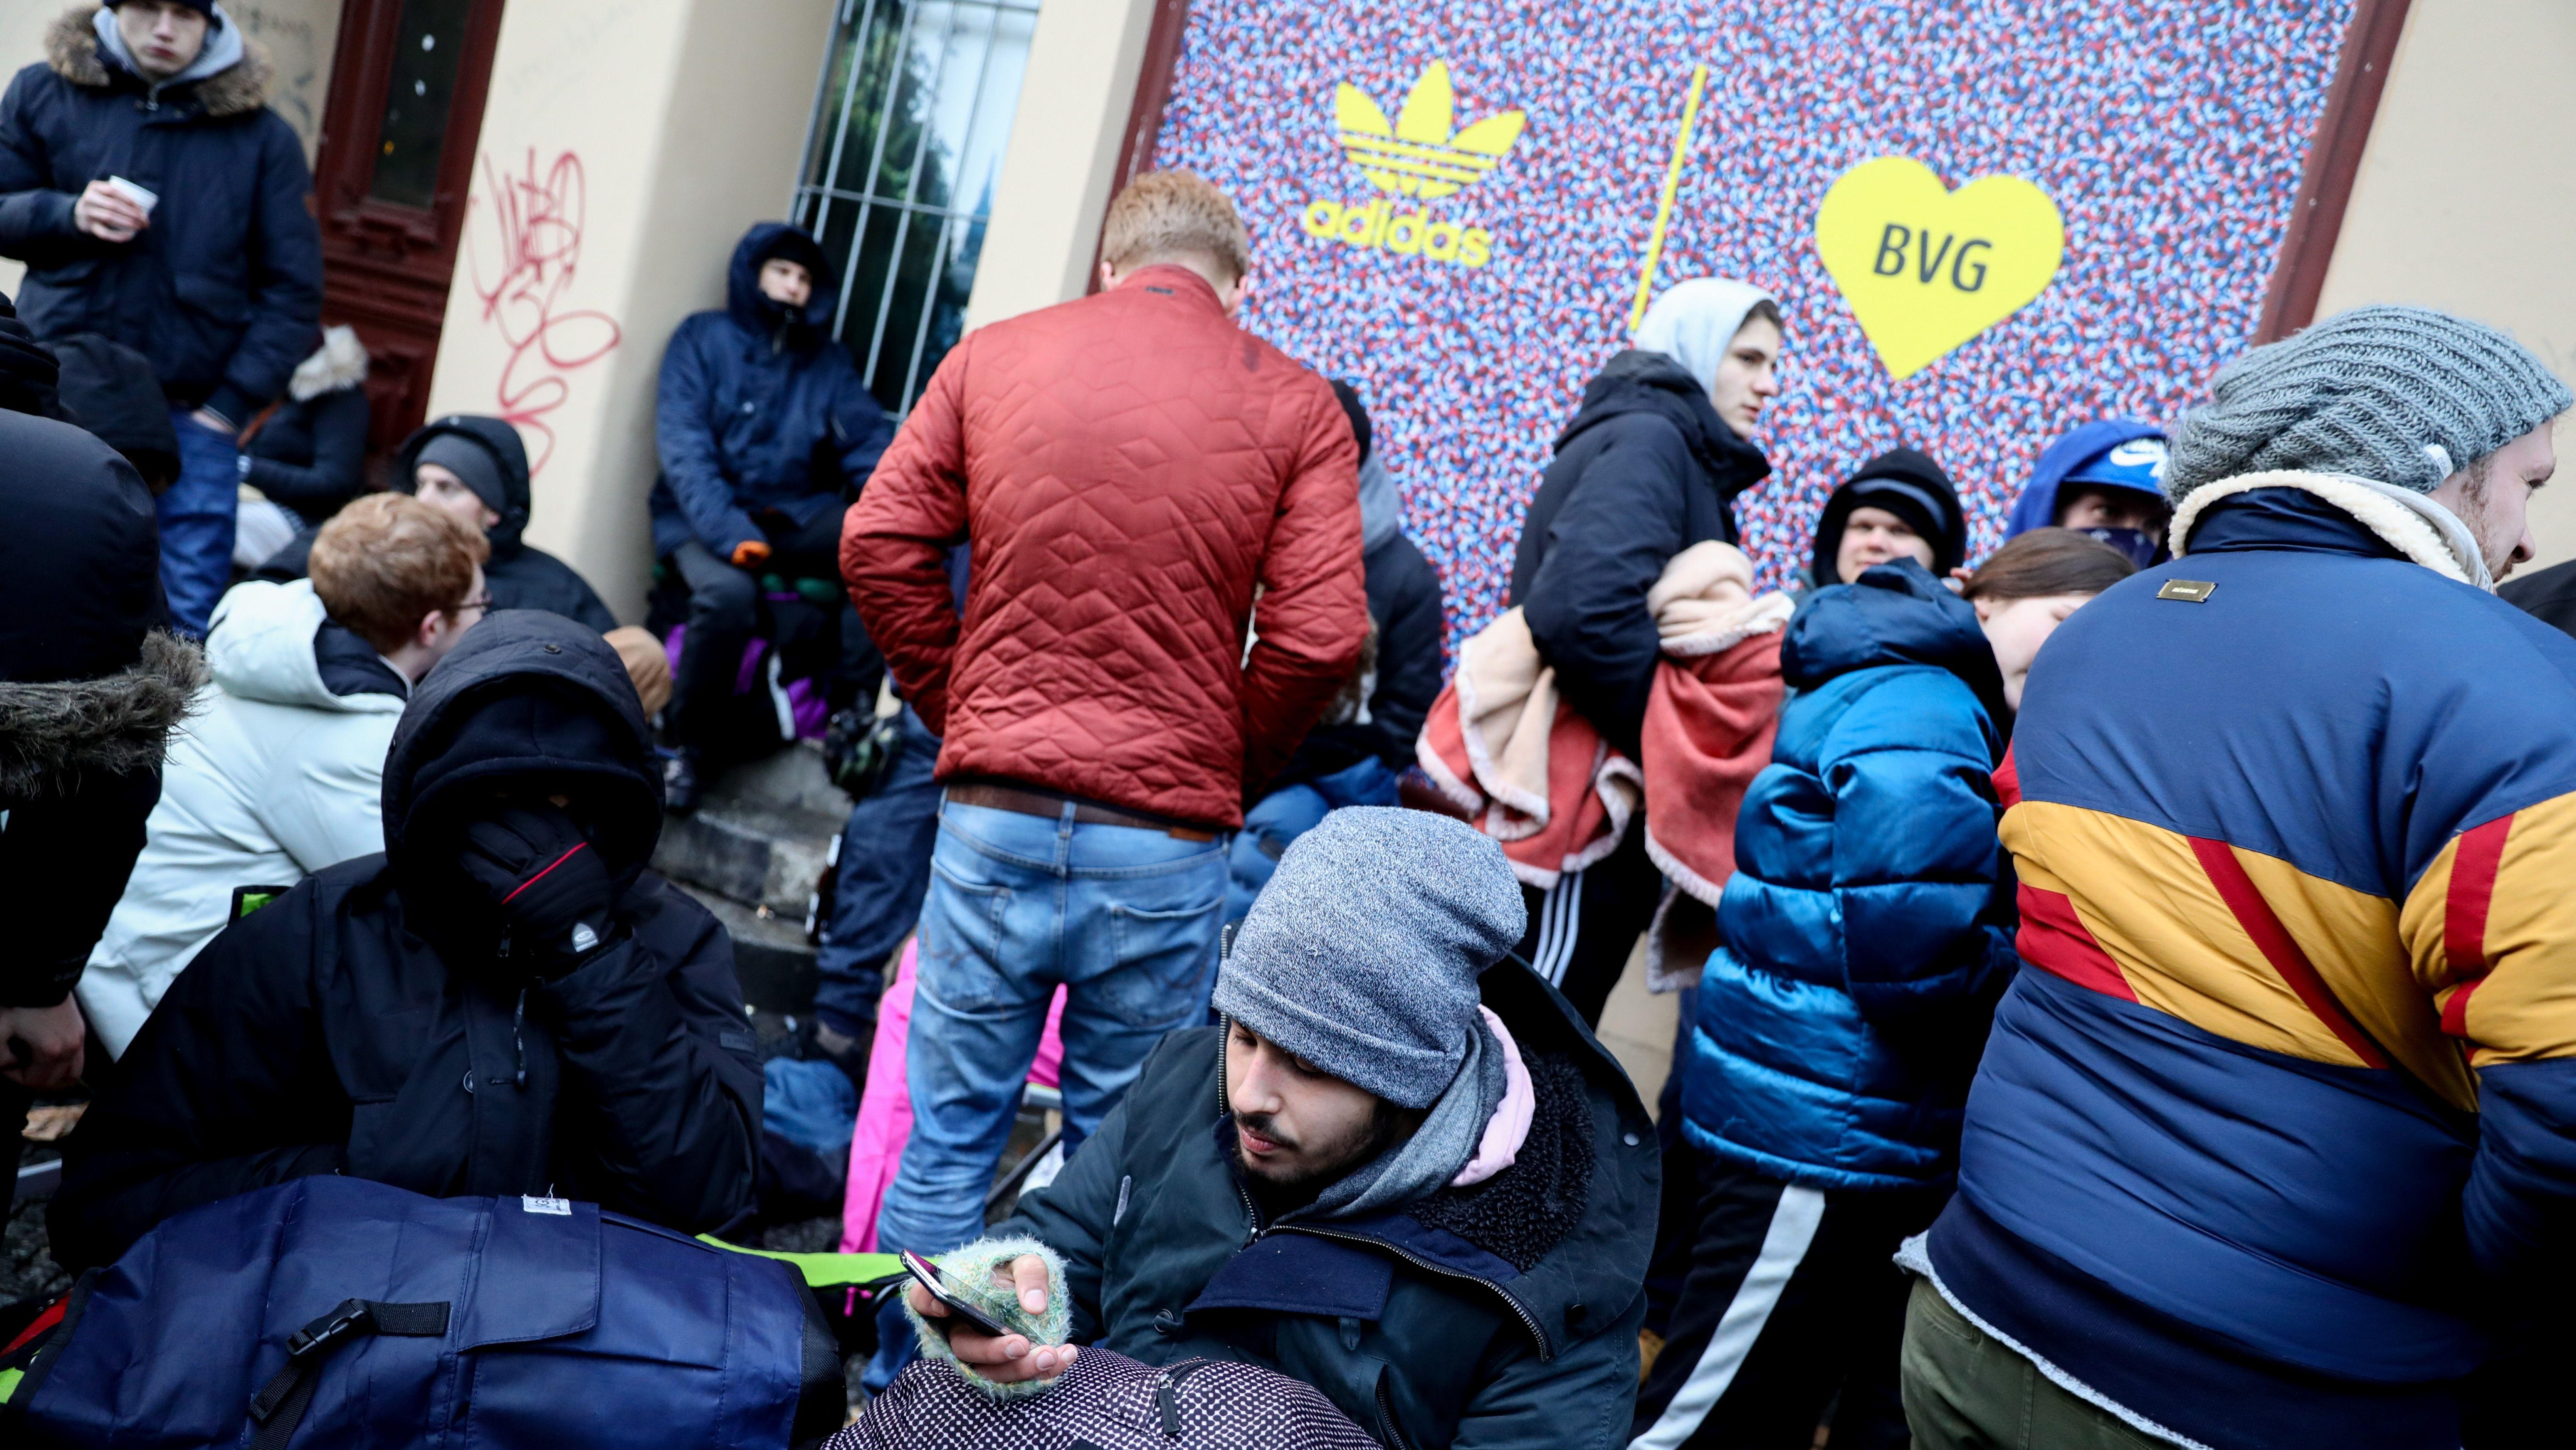 Riesiger Hype um BVG Sneaker: Hunderte Fans campieren über